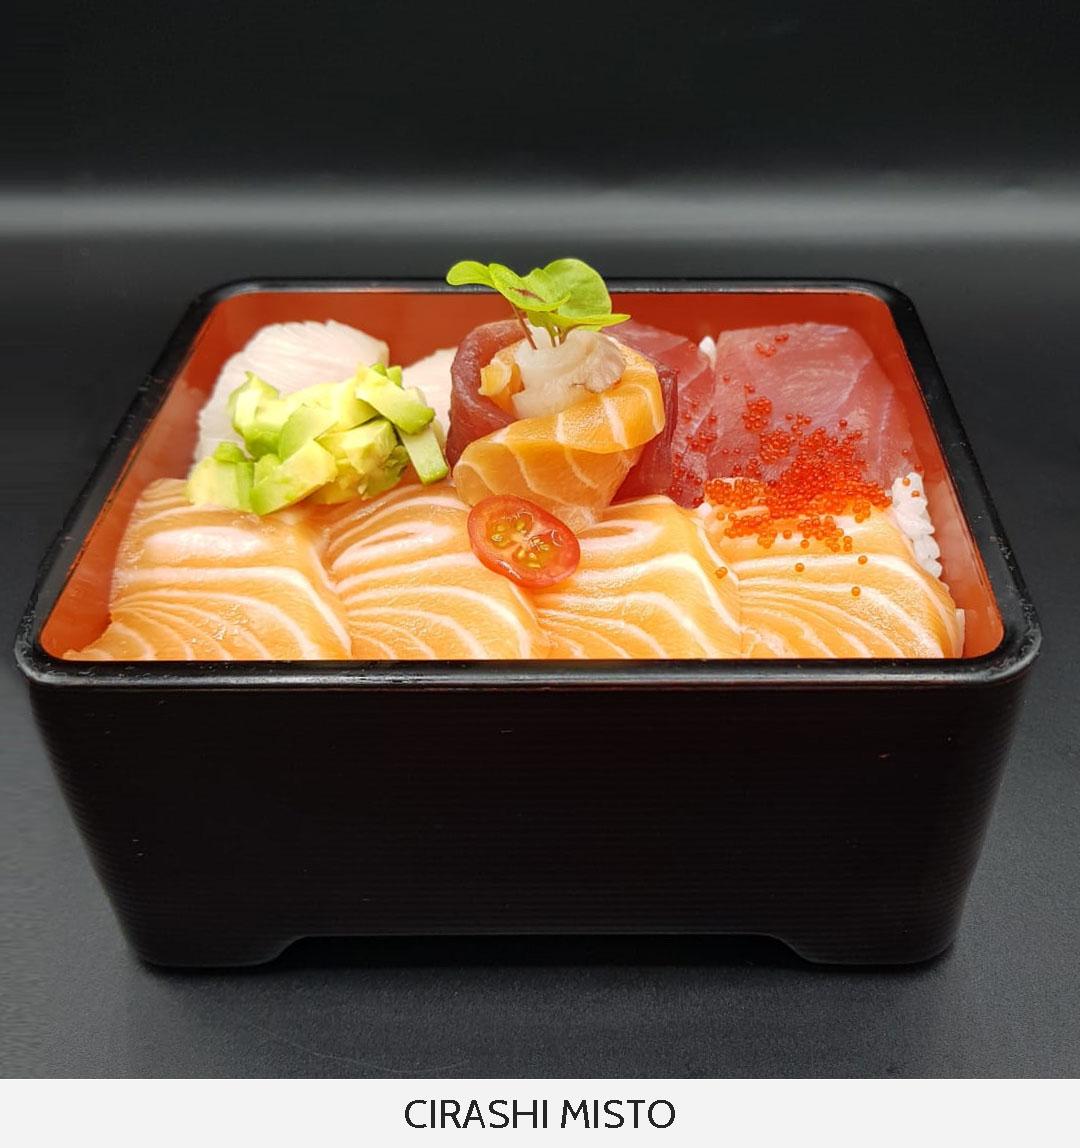 HOMU_CIRASHI_MISTO